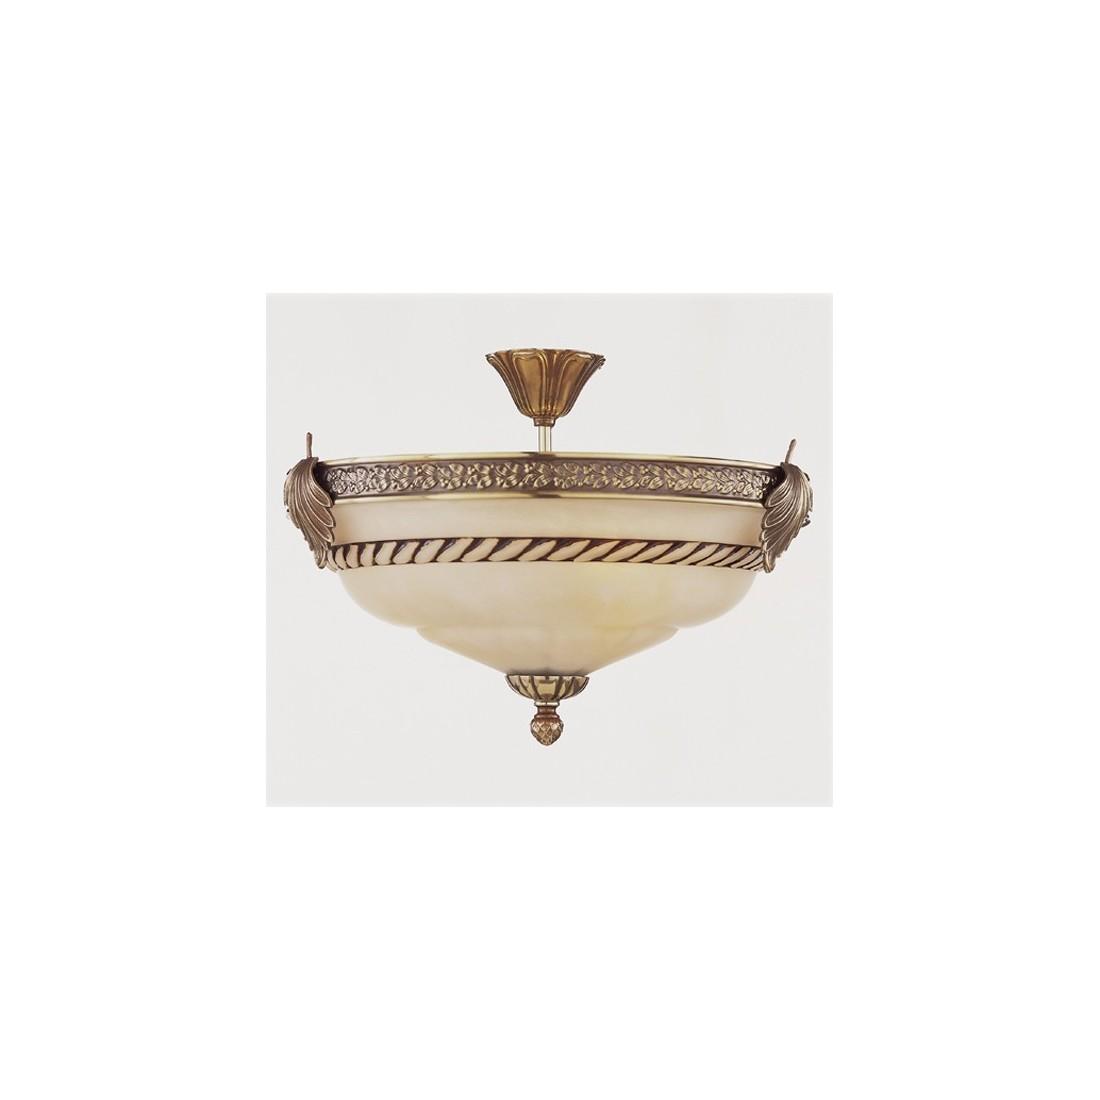 L mpara de bronce con dragones fabricada en espa a - Lamparas clasicas modernas ...